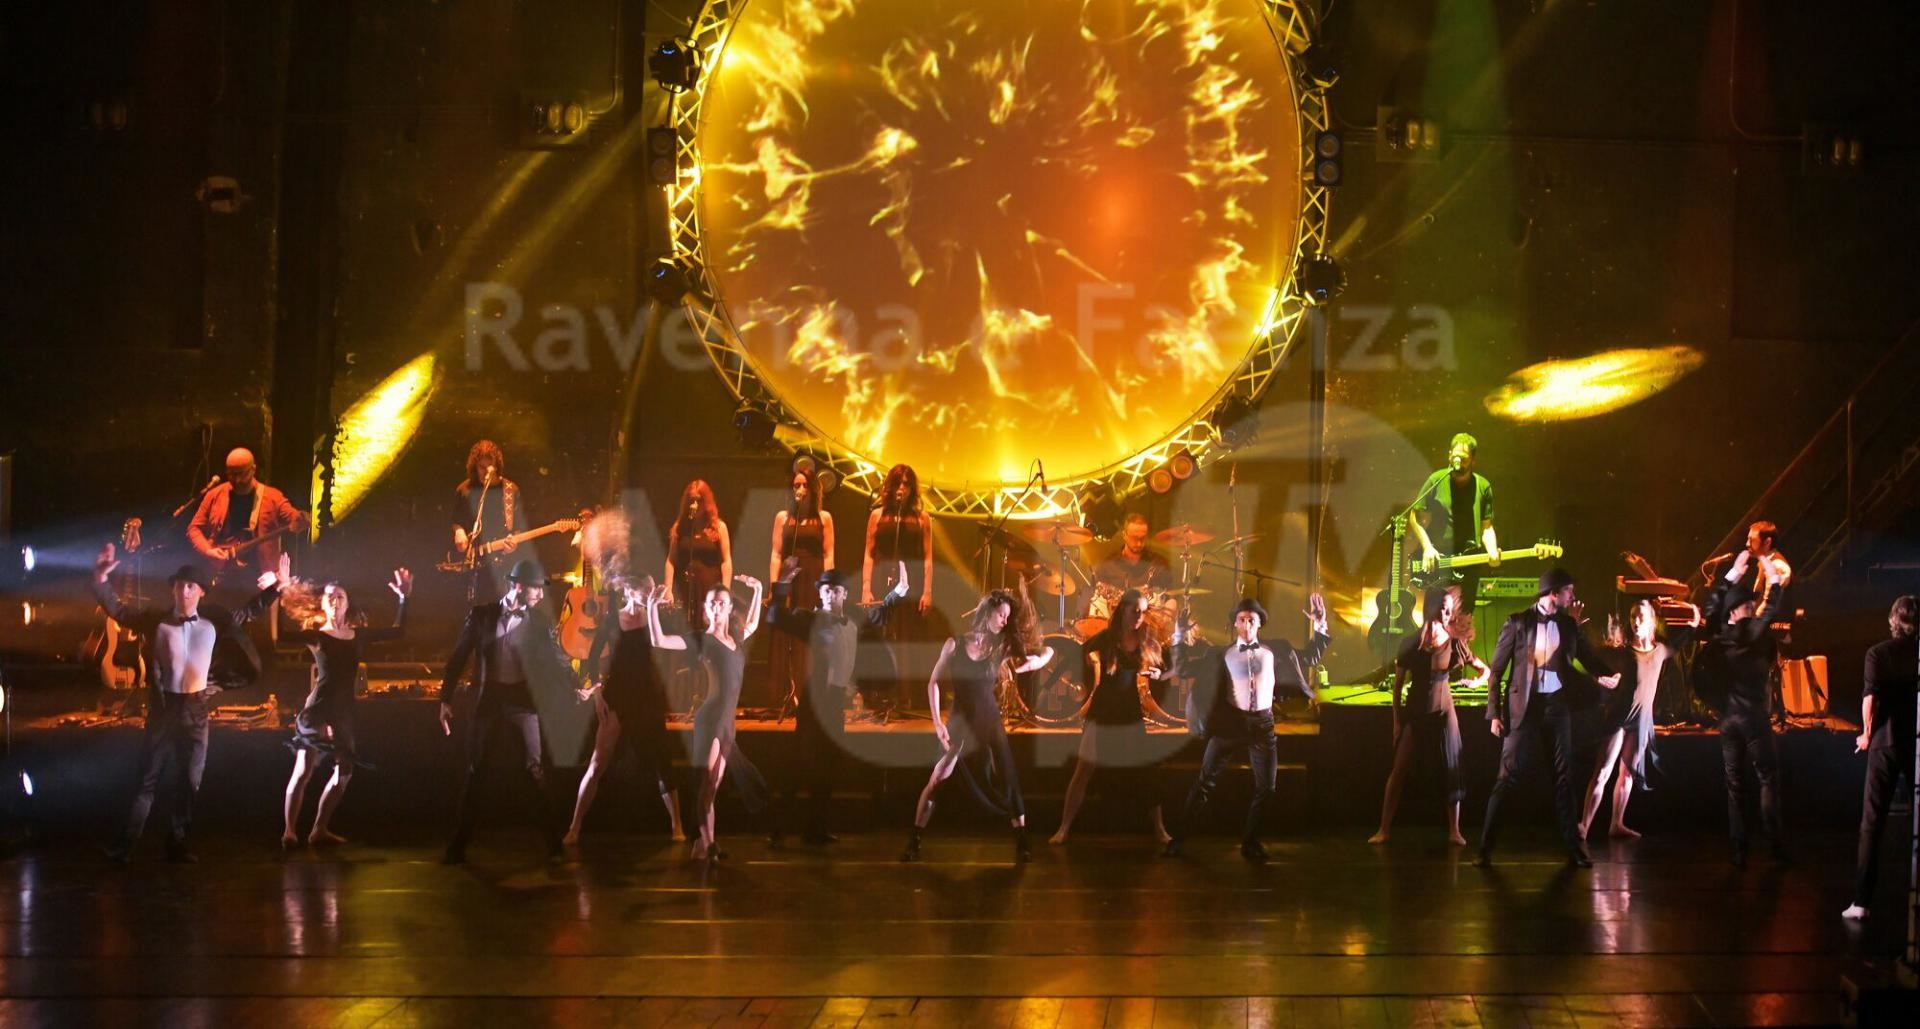 L'omaggio di Micha Van Hoecke ai Pink Floyd al Ravenna festival